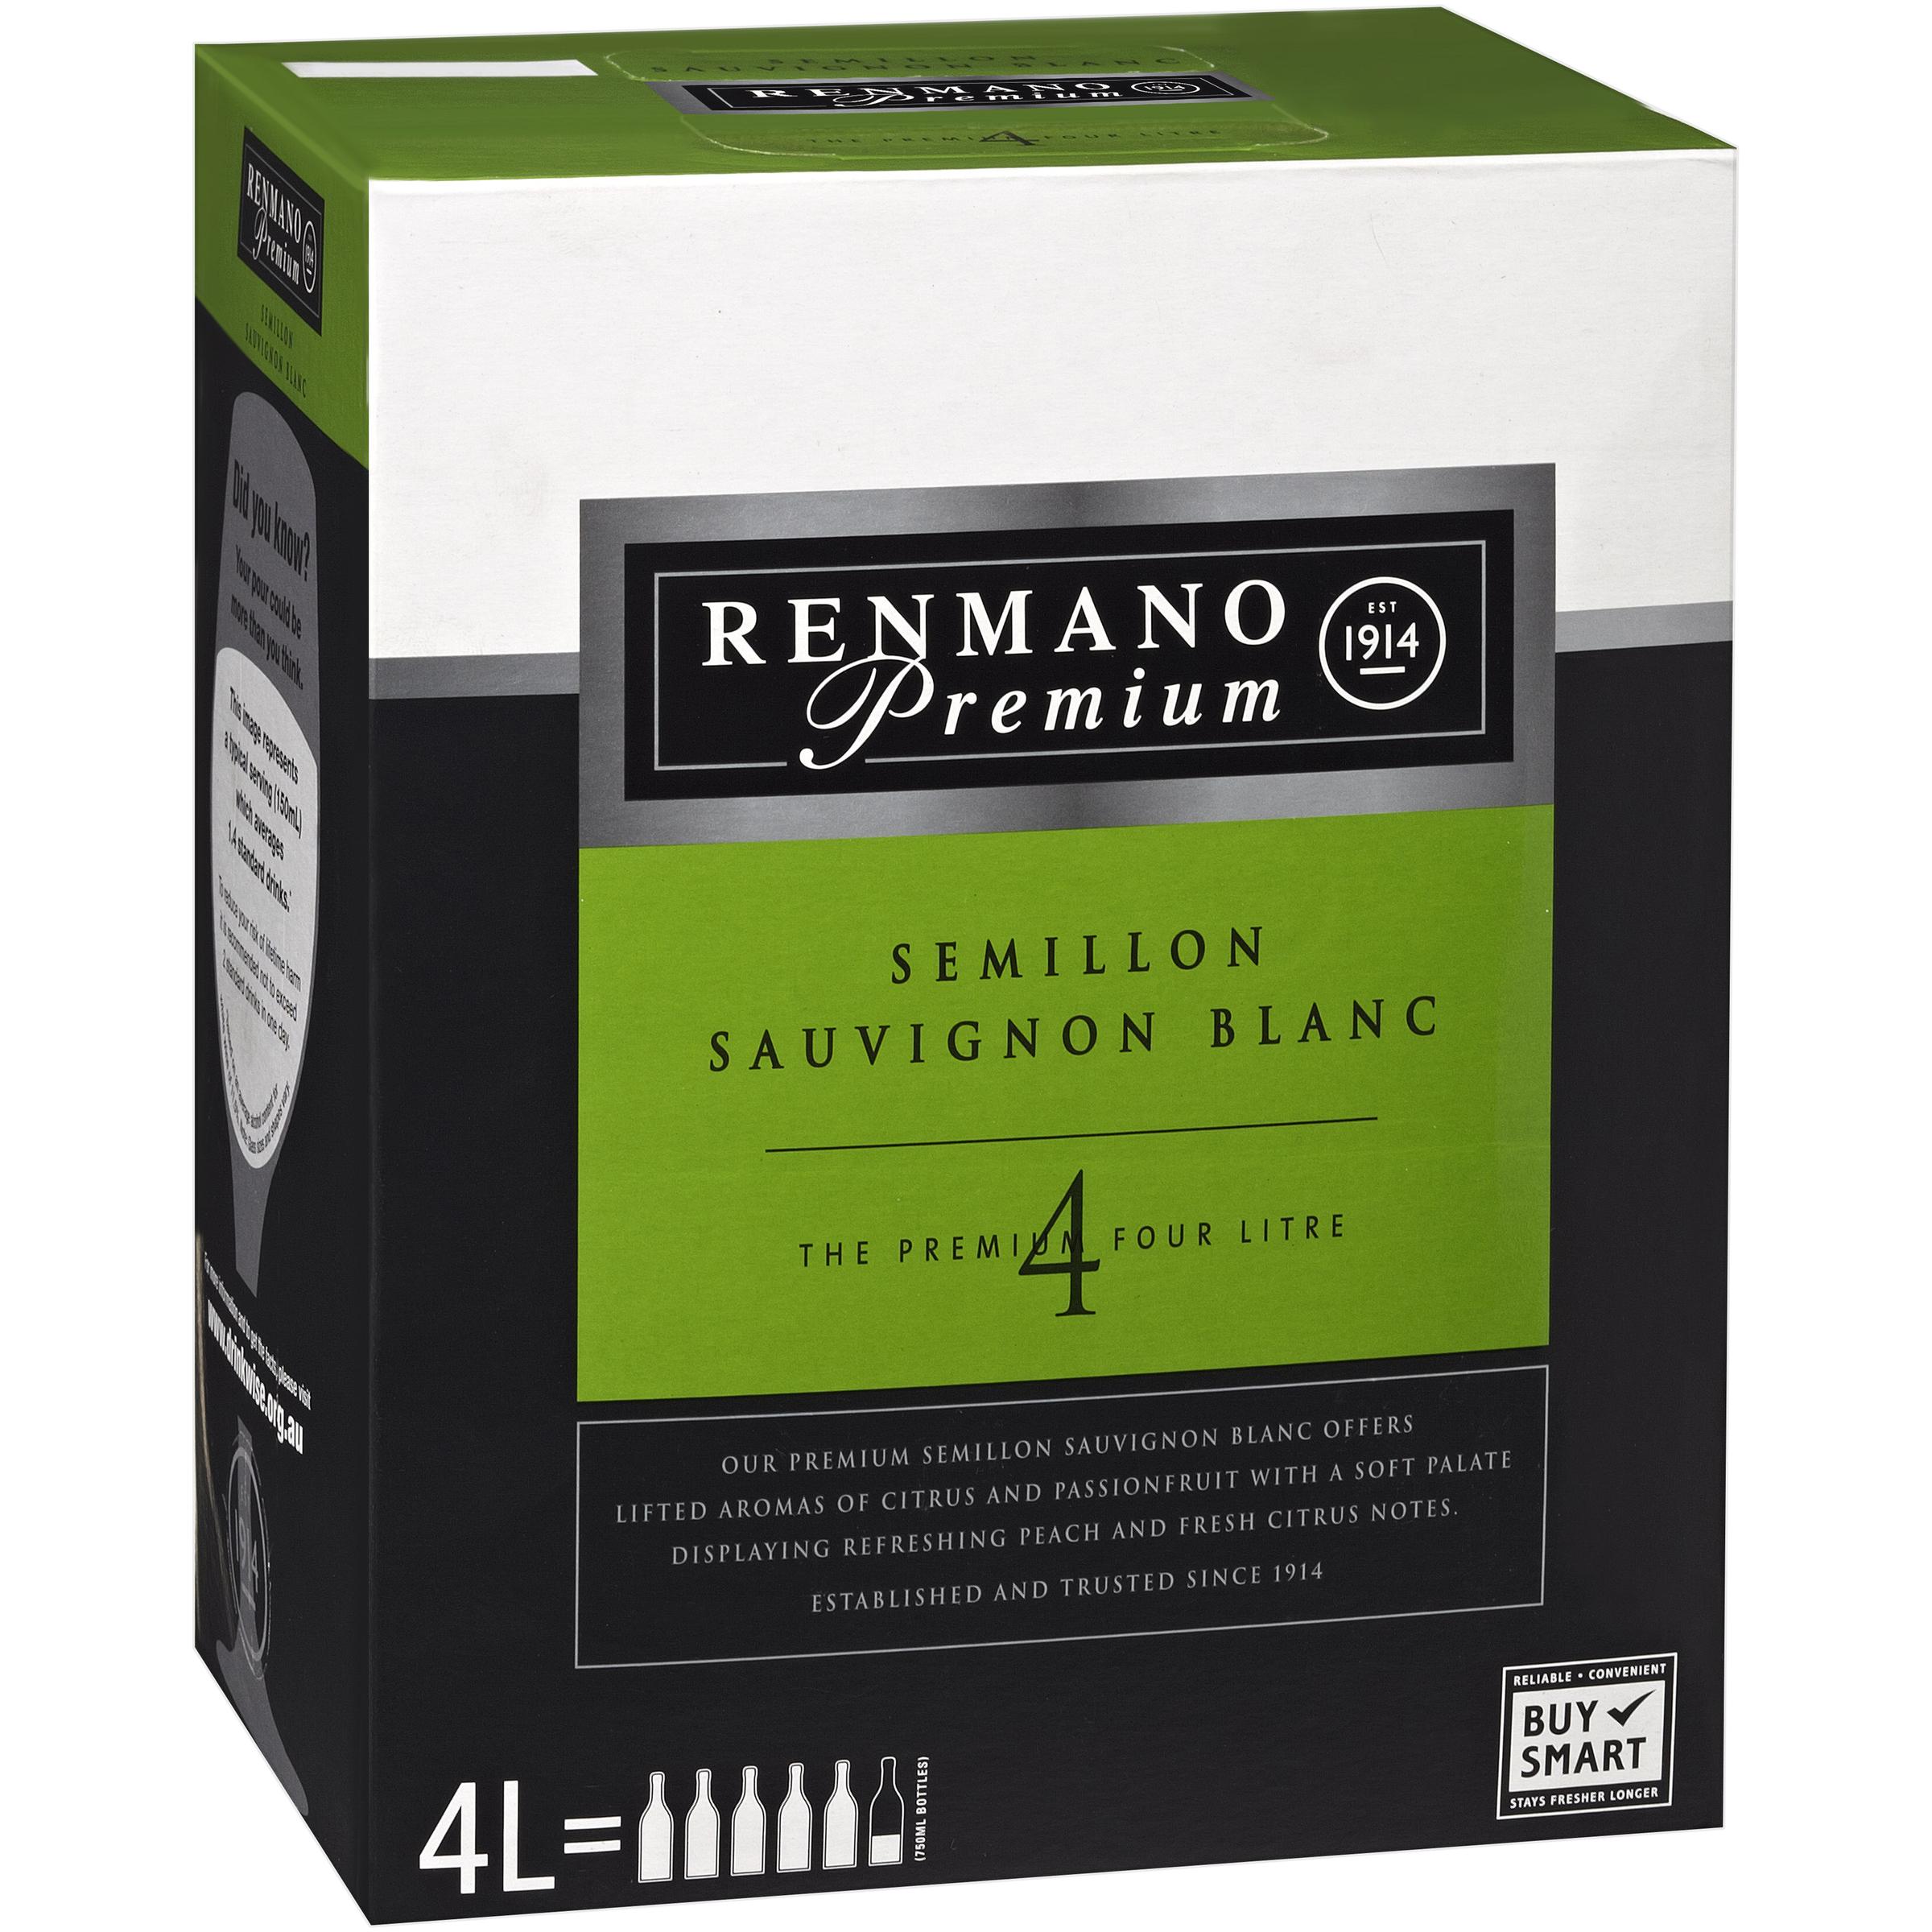 RENMANO PREMIUM SEMILLON SAUVIGNON BLANC CHARDONNAY